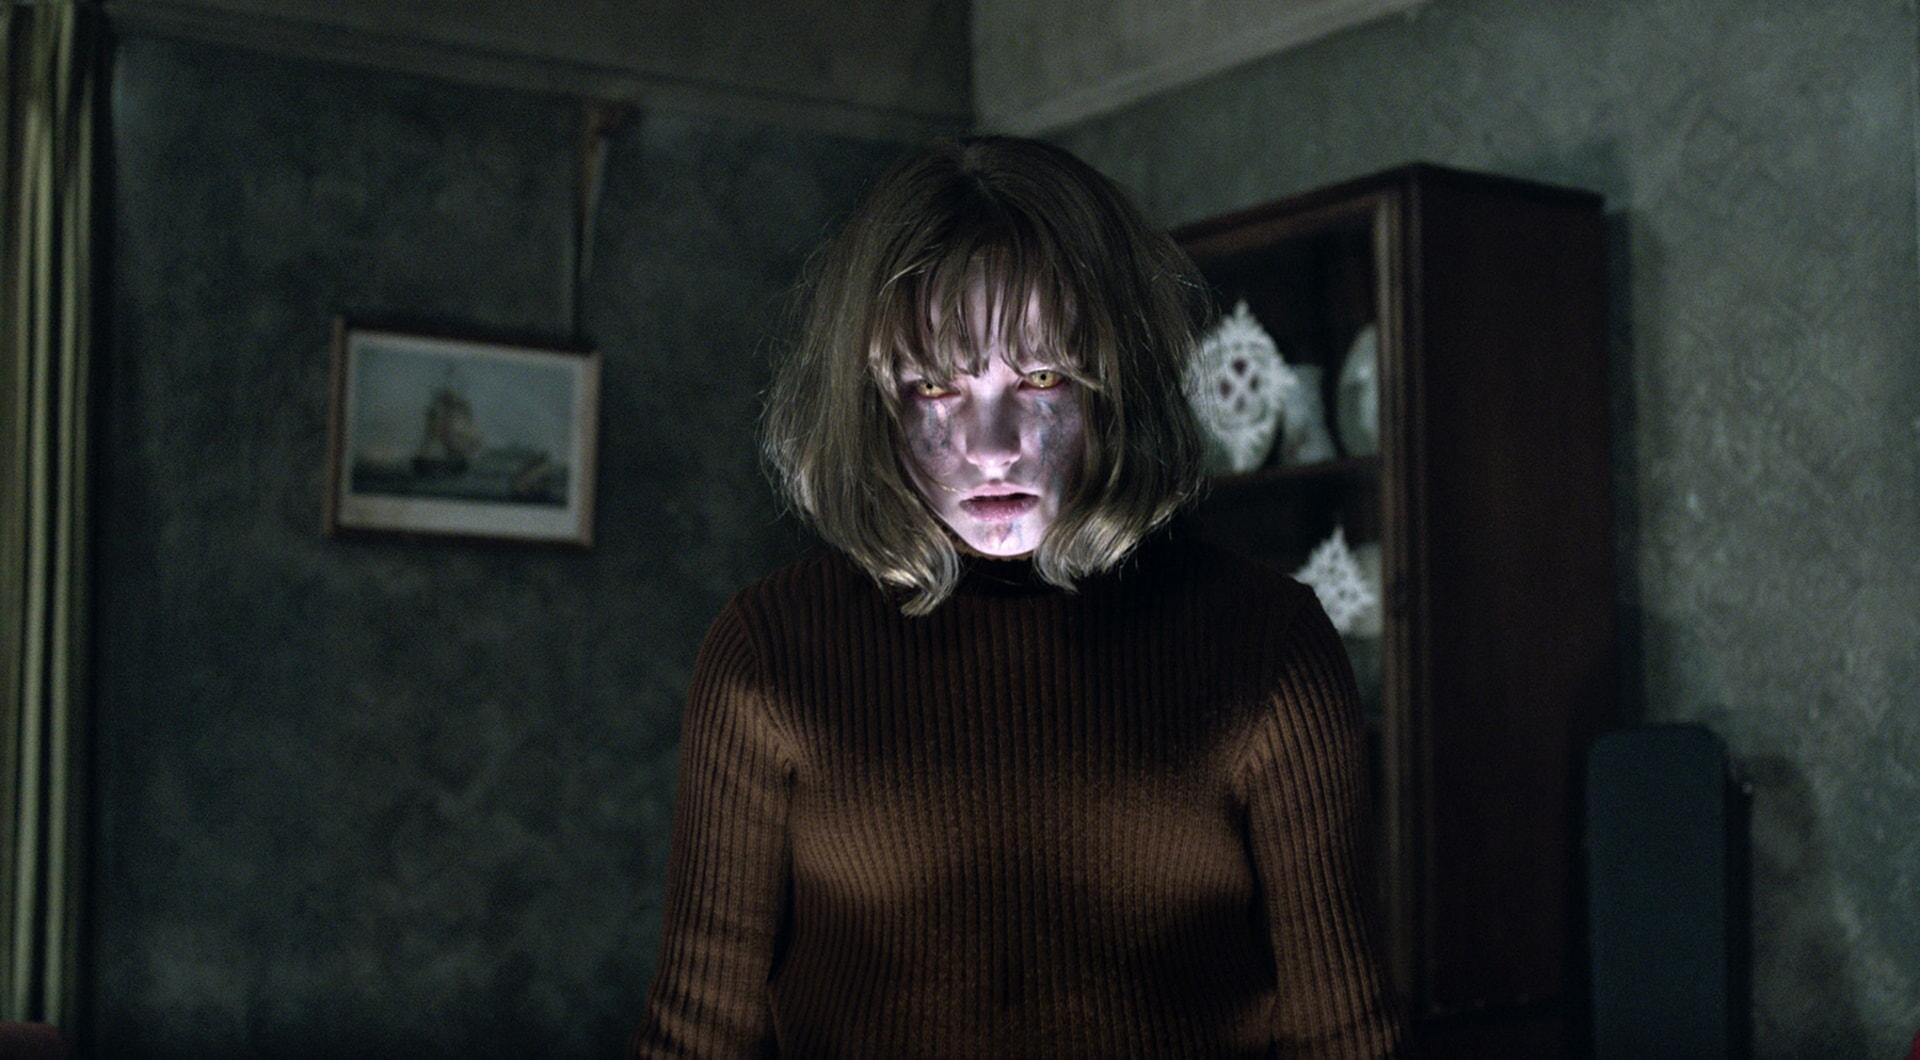 MADISON WOLFE as Janet Hodgson seemingly possessed